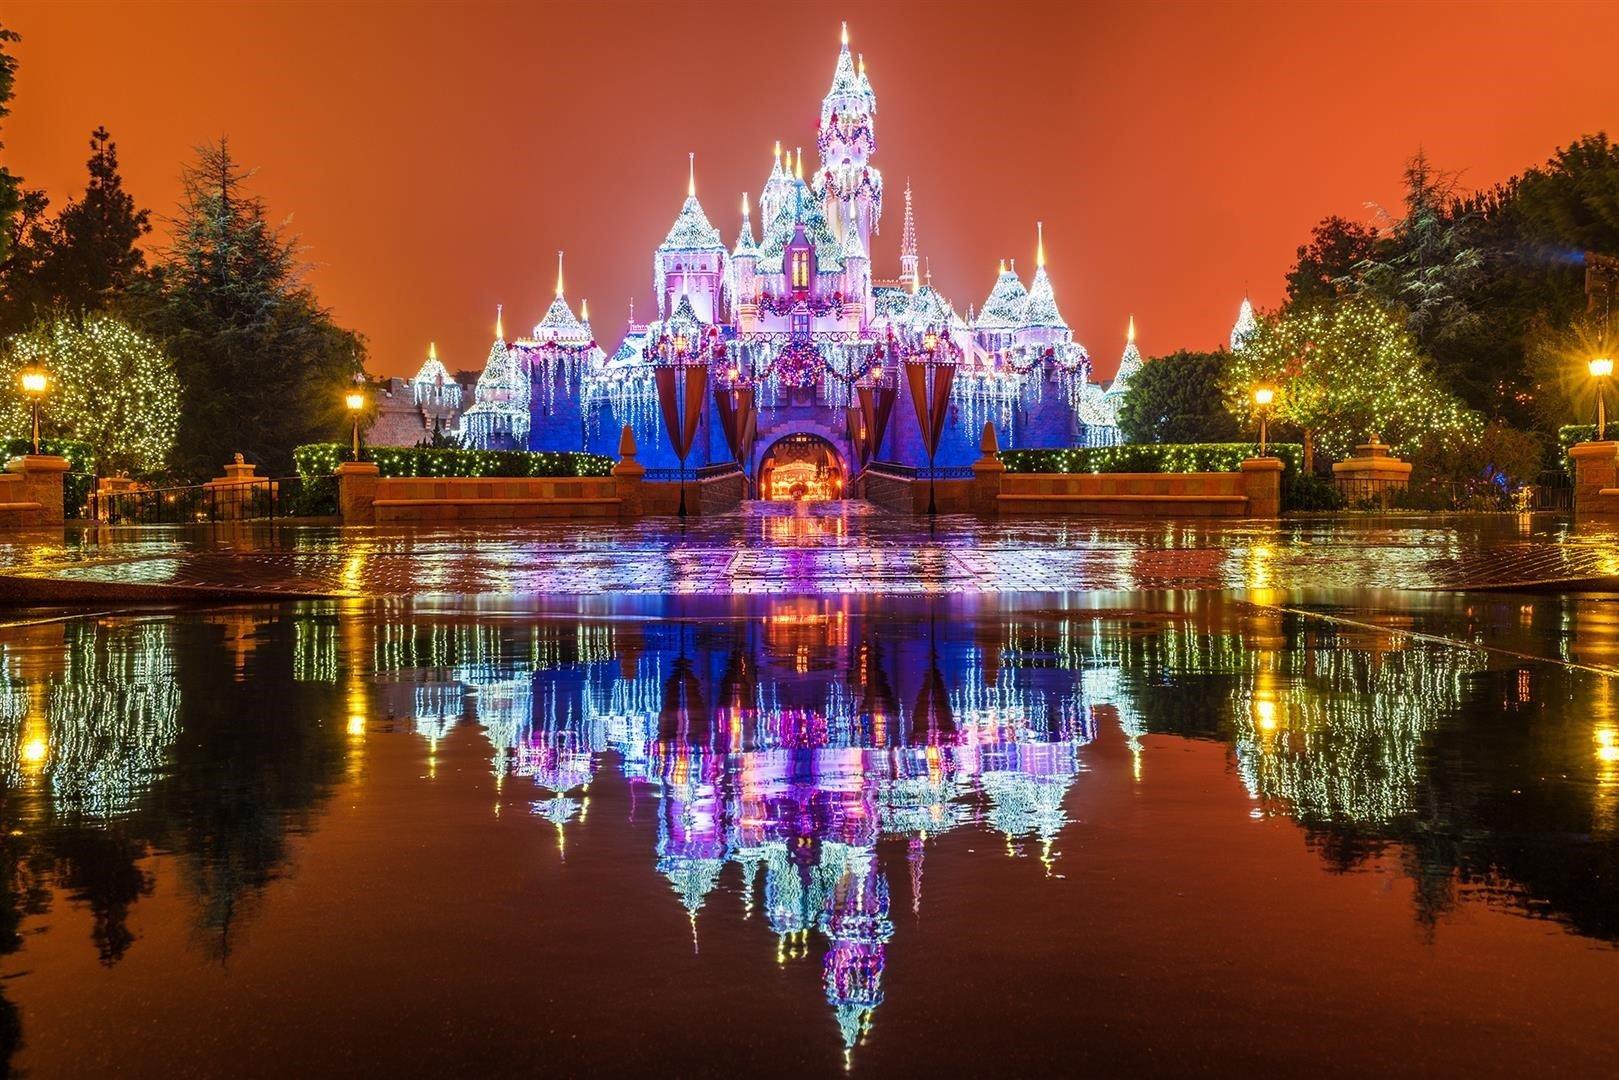 Enjoy the Magic of Disney this Christmas: At Disneyland